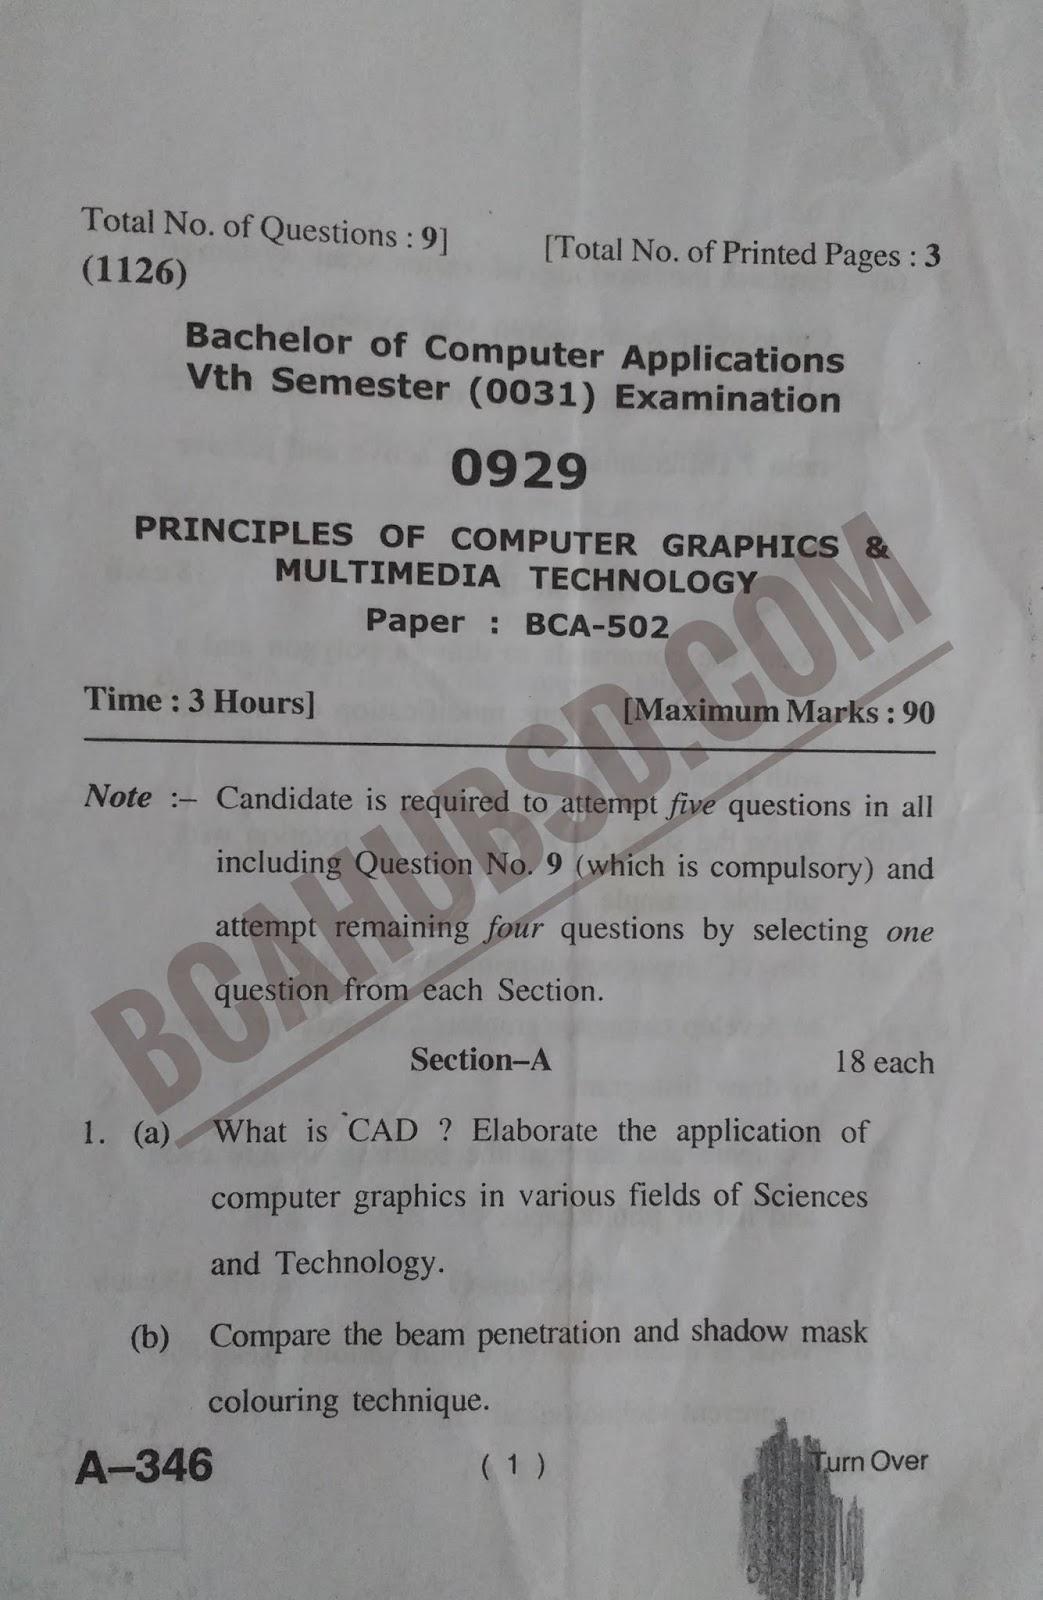 PRINCIPLES OF COMPUTER GRAPHICS & MULTIMEDIA TECHNOLOGY SYLLABUS